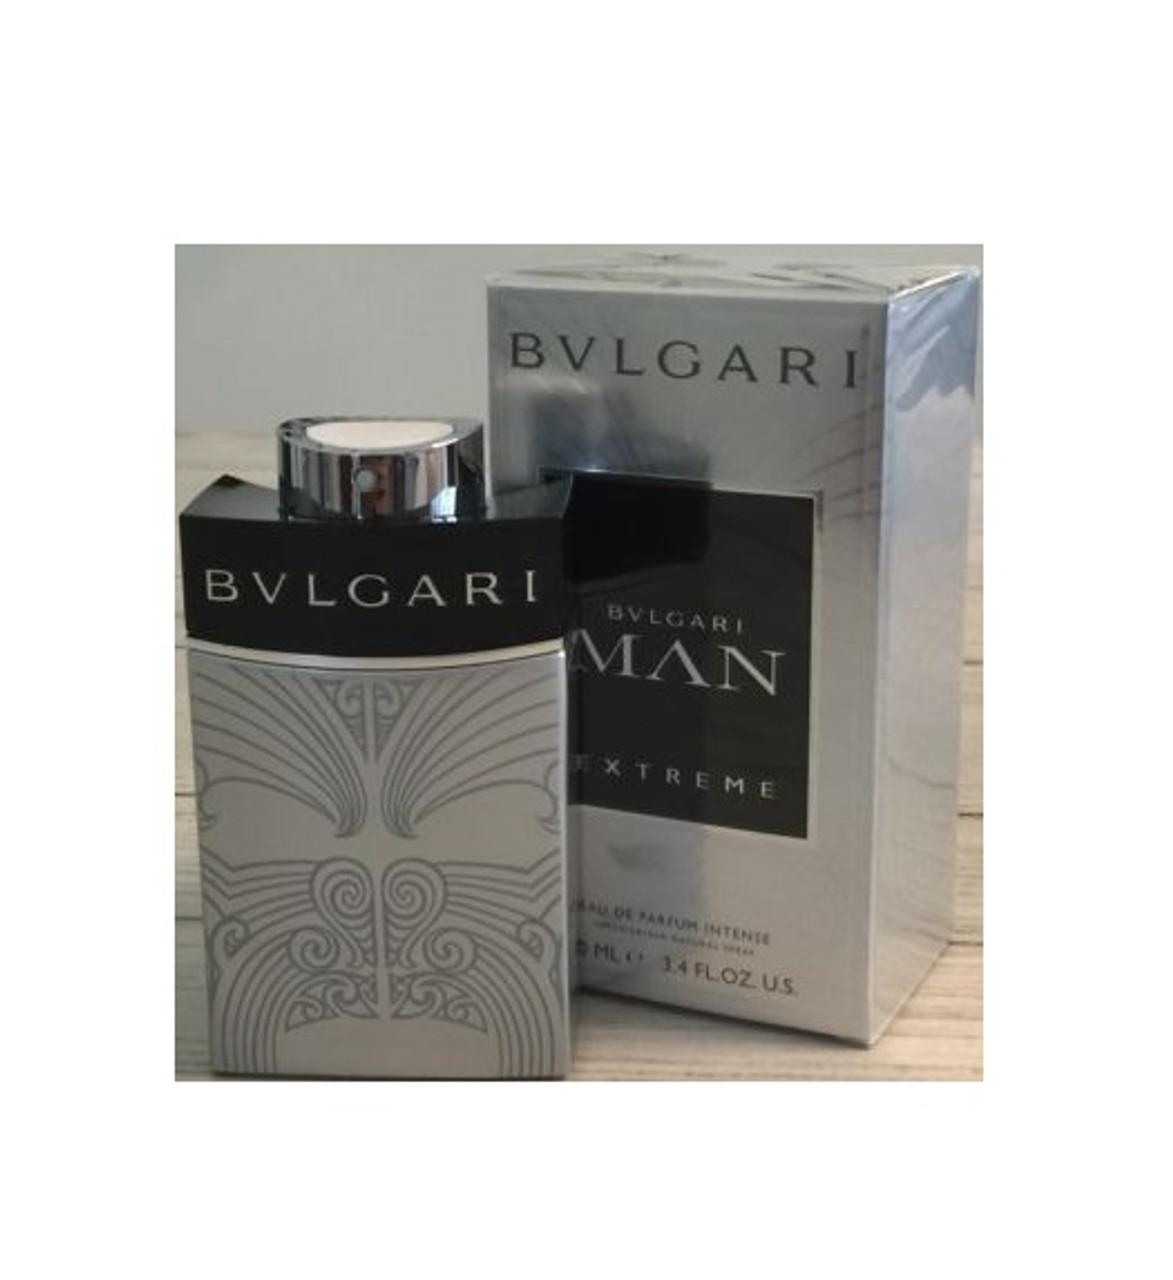 Bvlgari Man Extreme Intense Eau De Parfum Spray 34 Oz Perfume Depot